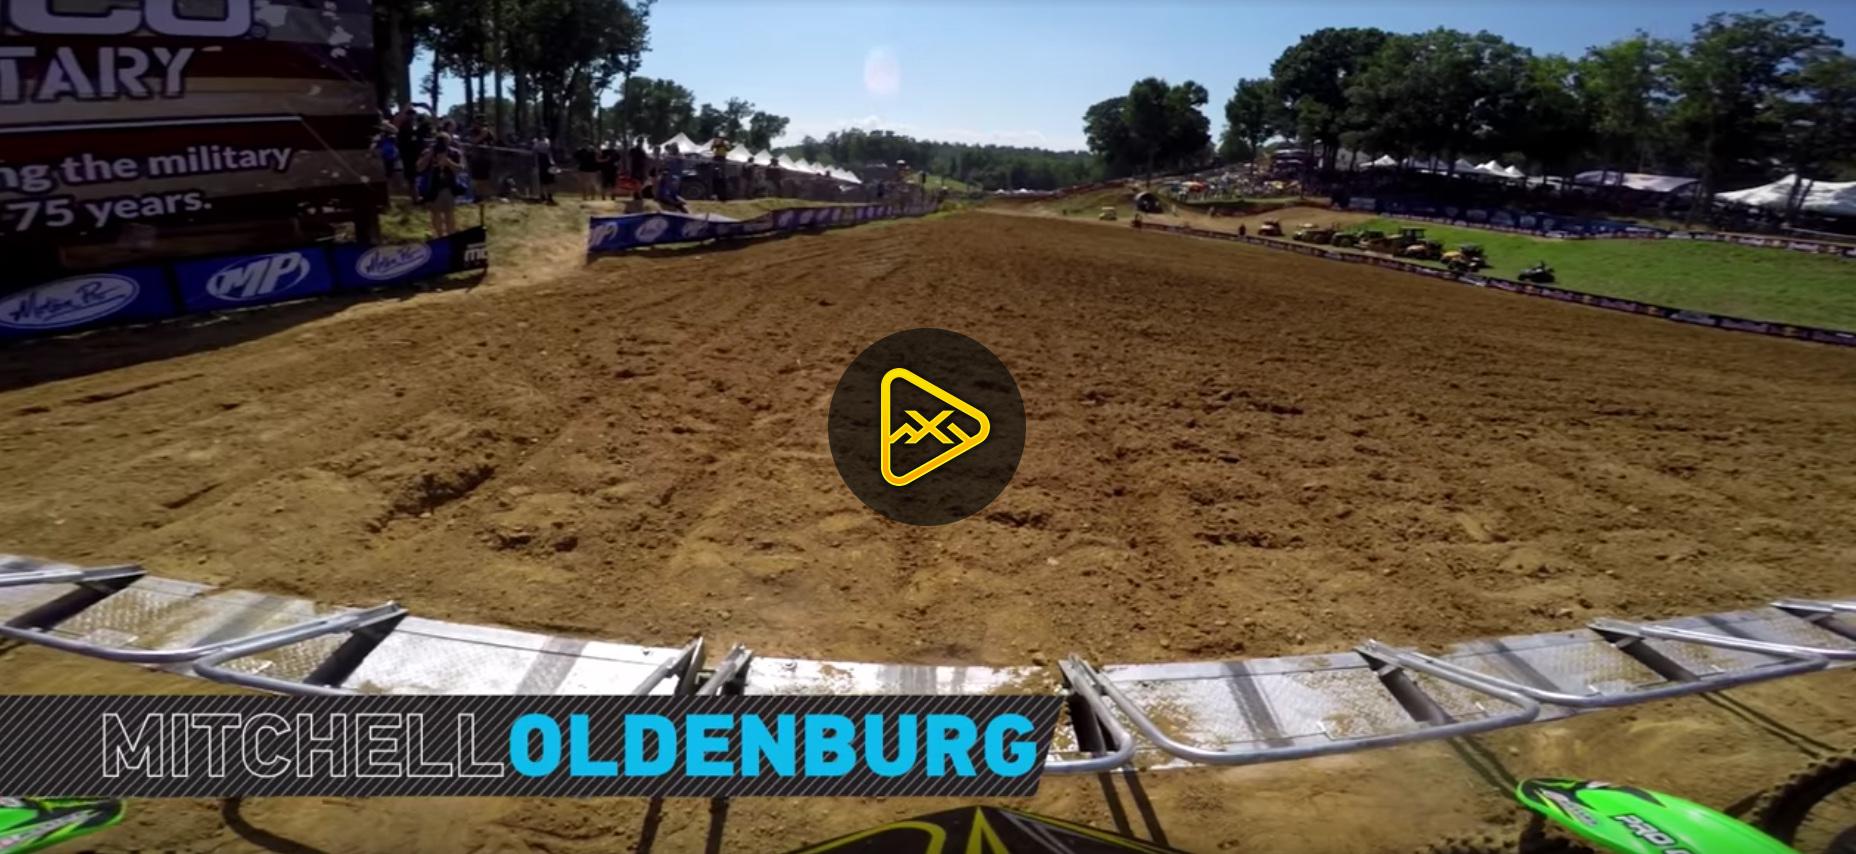 GoPro Helmet Cam: Mitchell Oldenburg at 2016 Budds Creek National